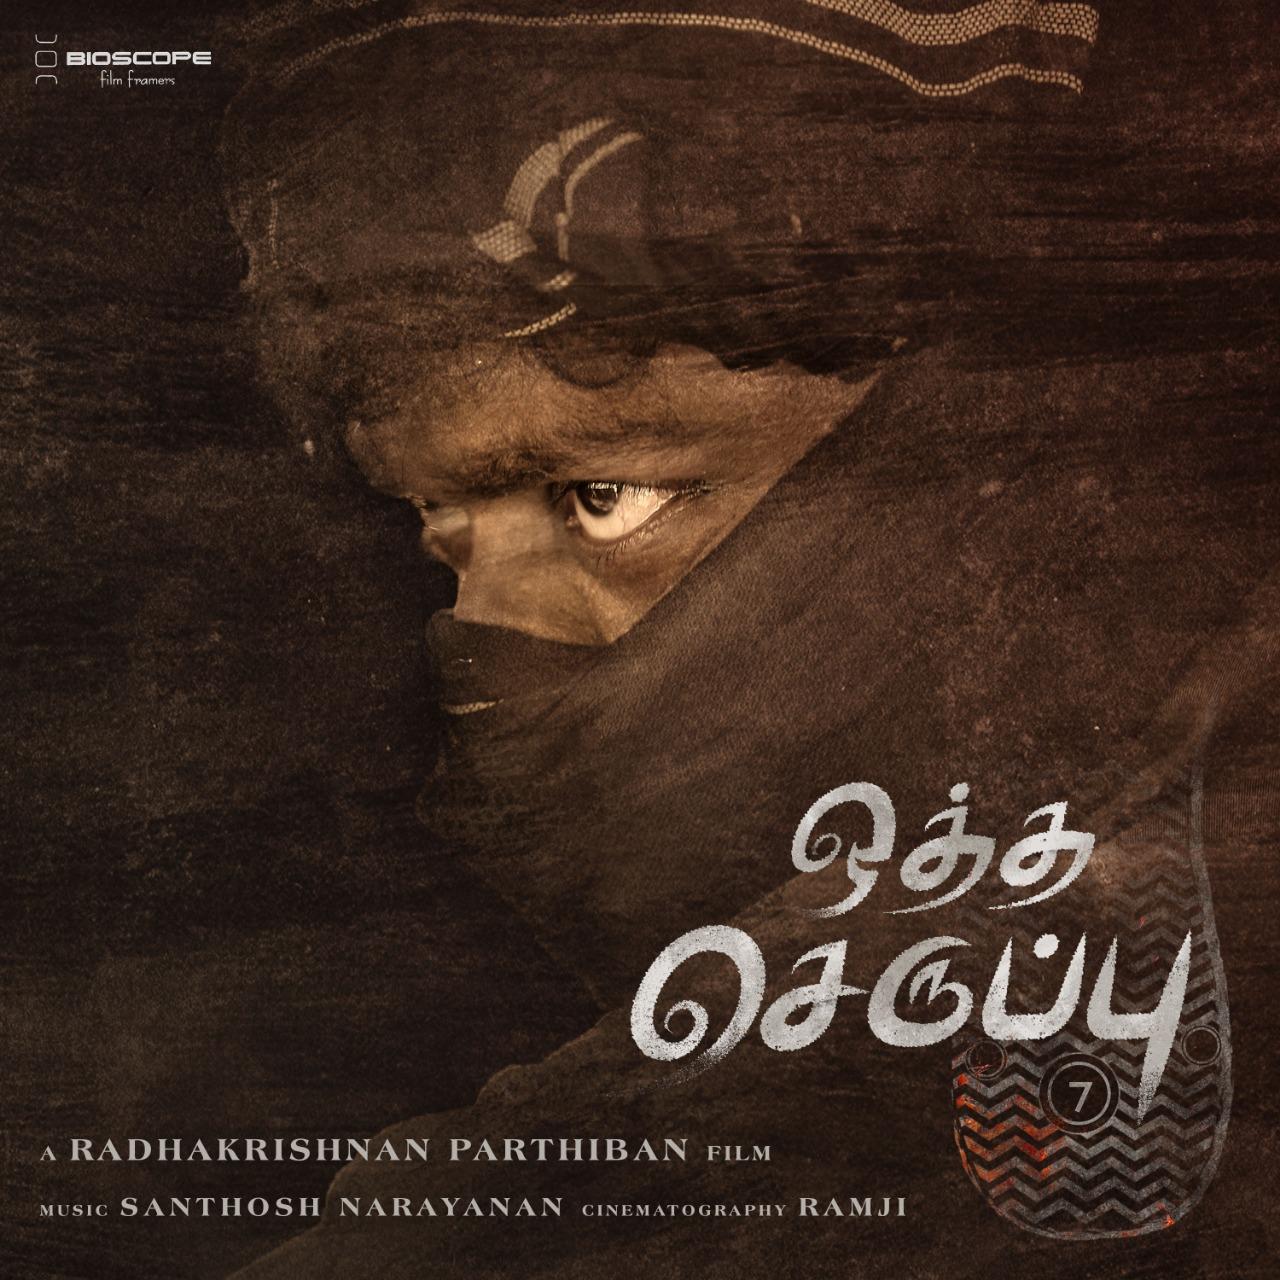 R Parthiban Oththa Serupu Size 7 Movie Poster